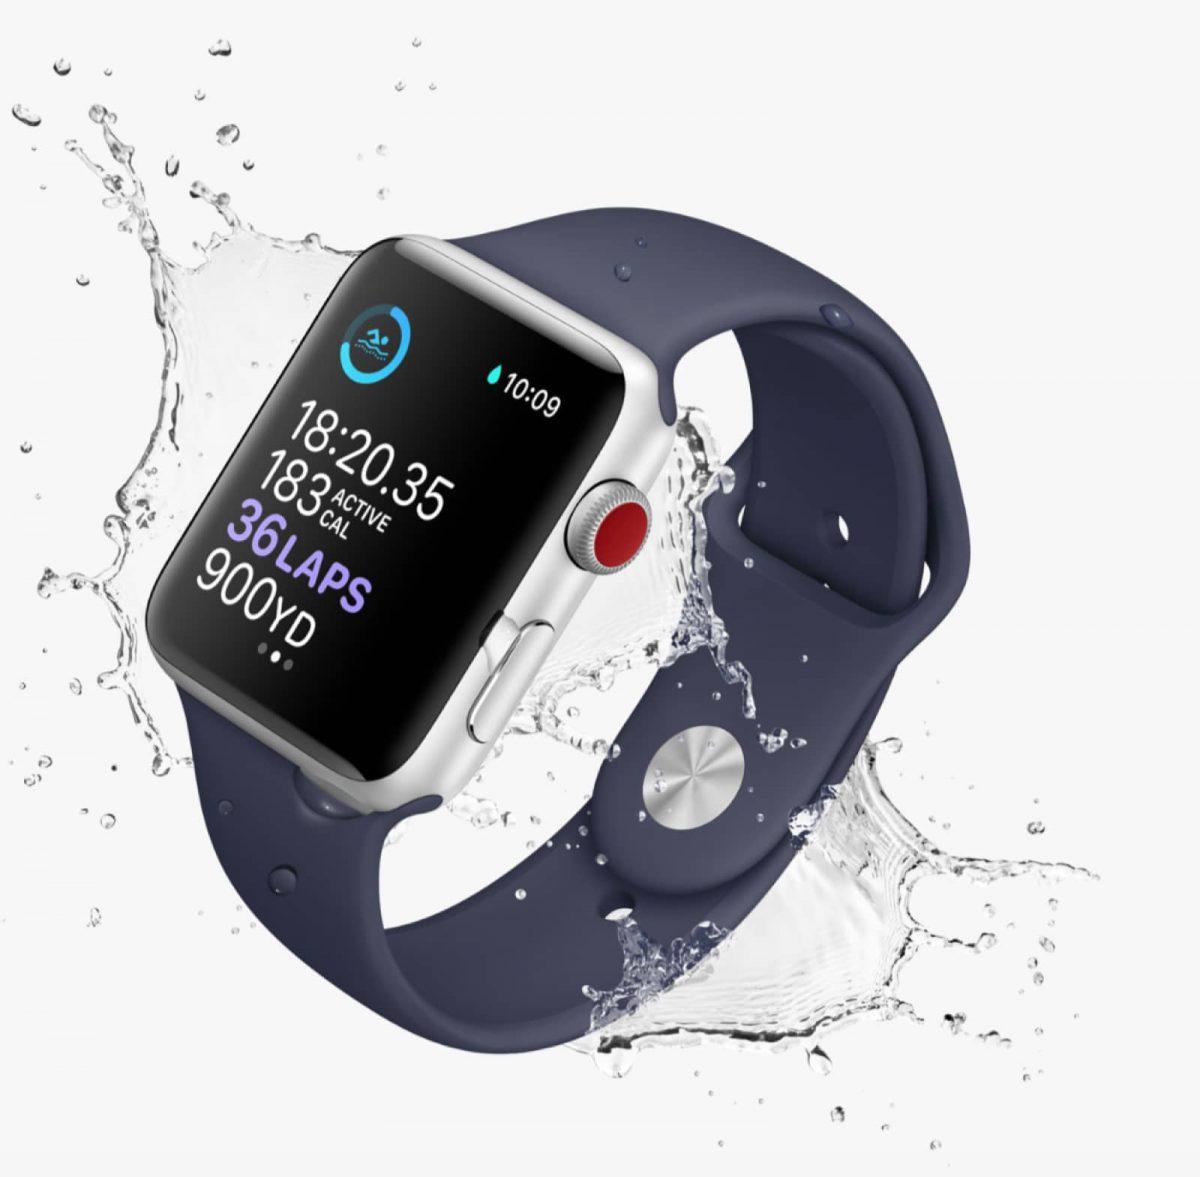 Apple Watch LTE image.